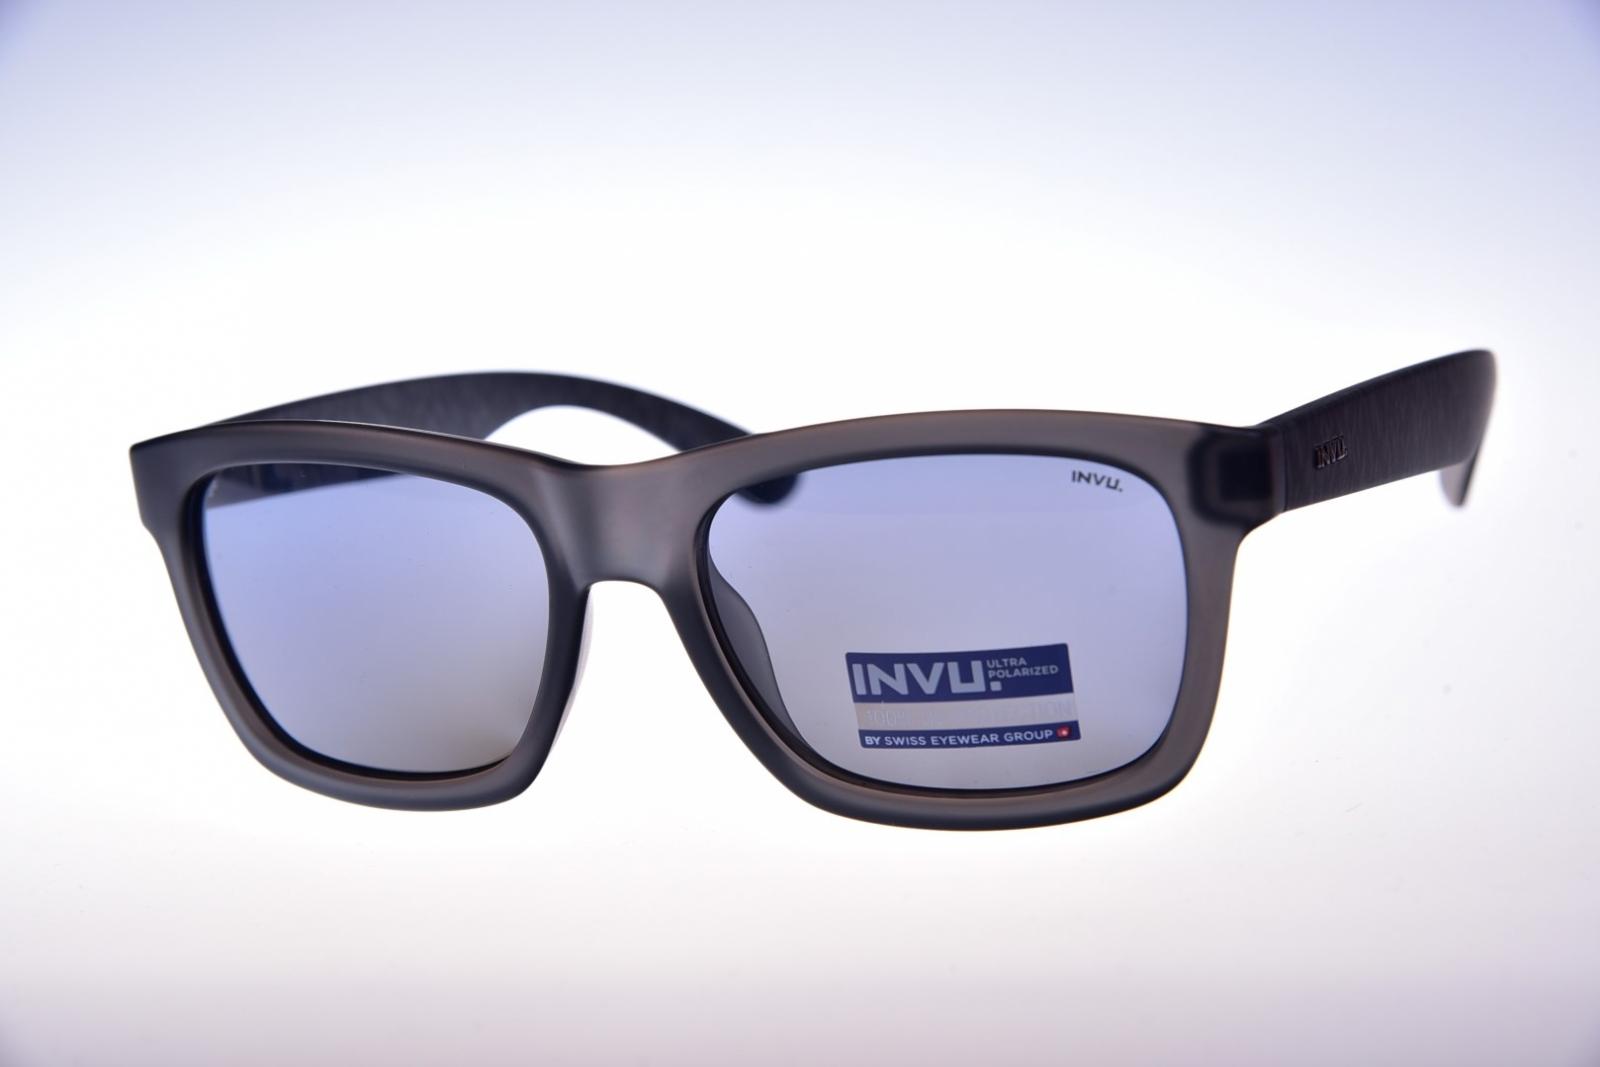 INVU. Classic B2720A - Unisex slnečné okuliare